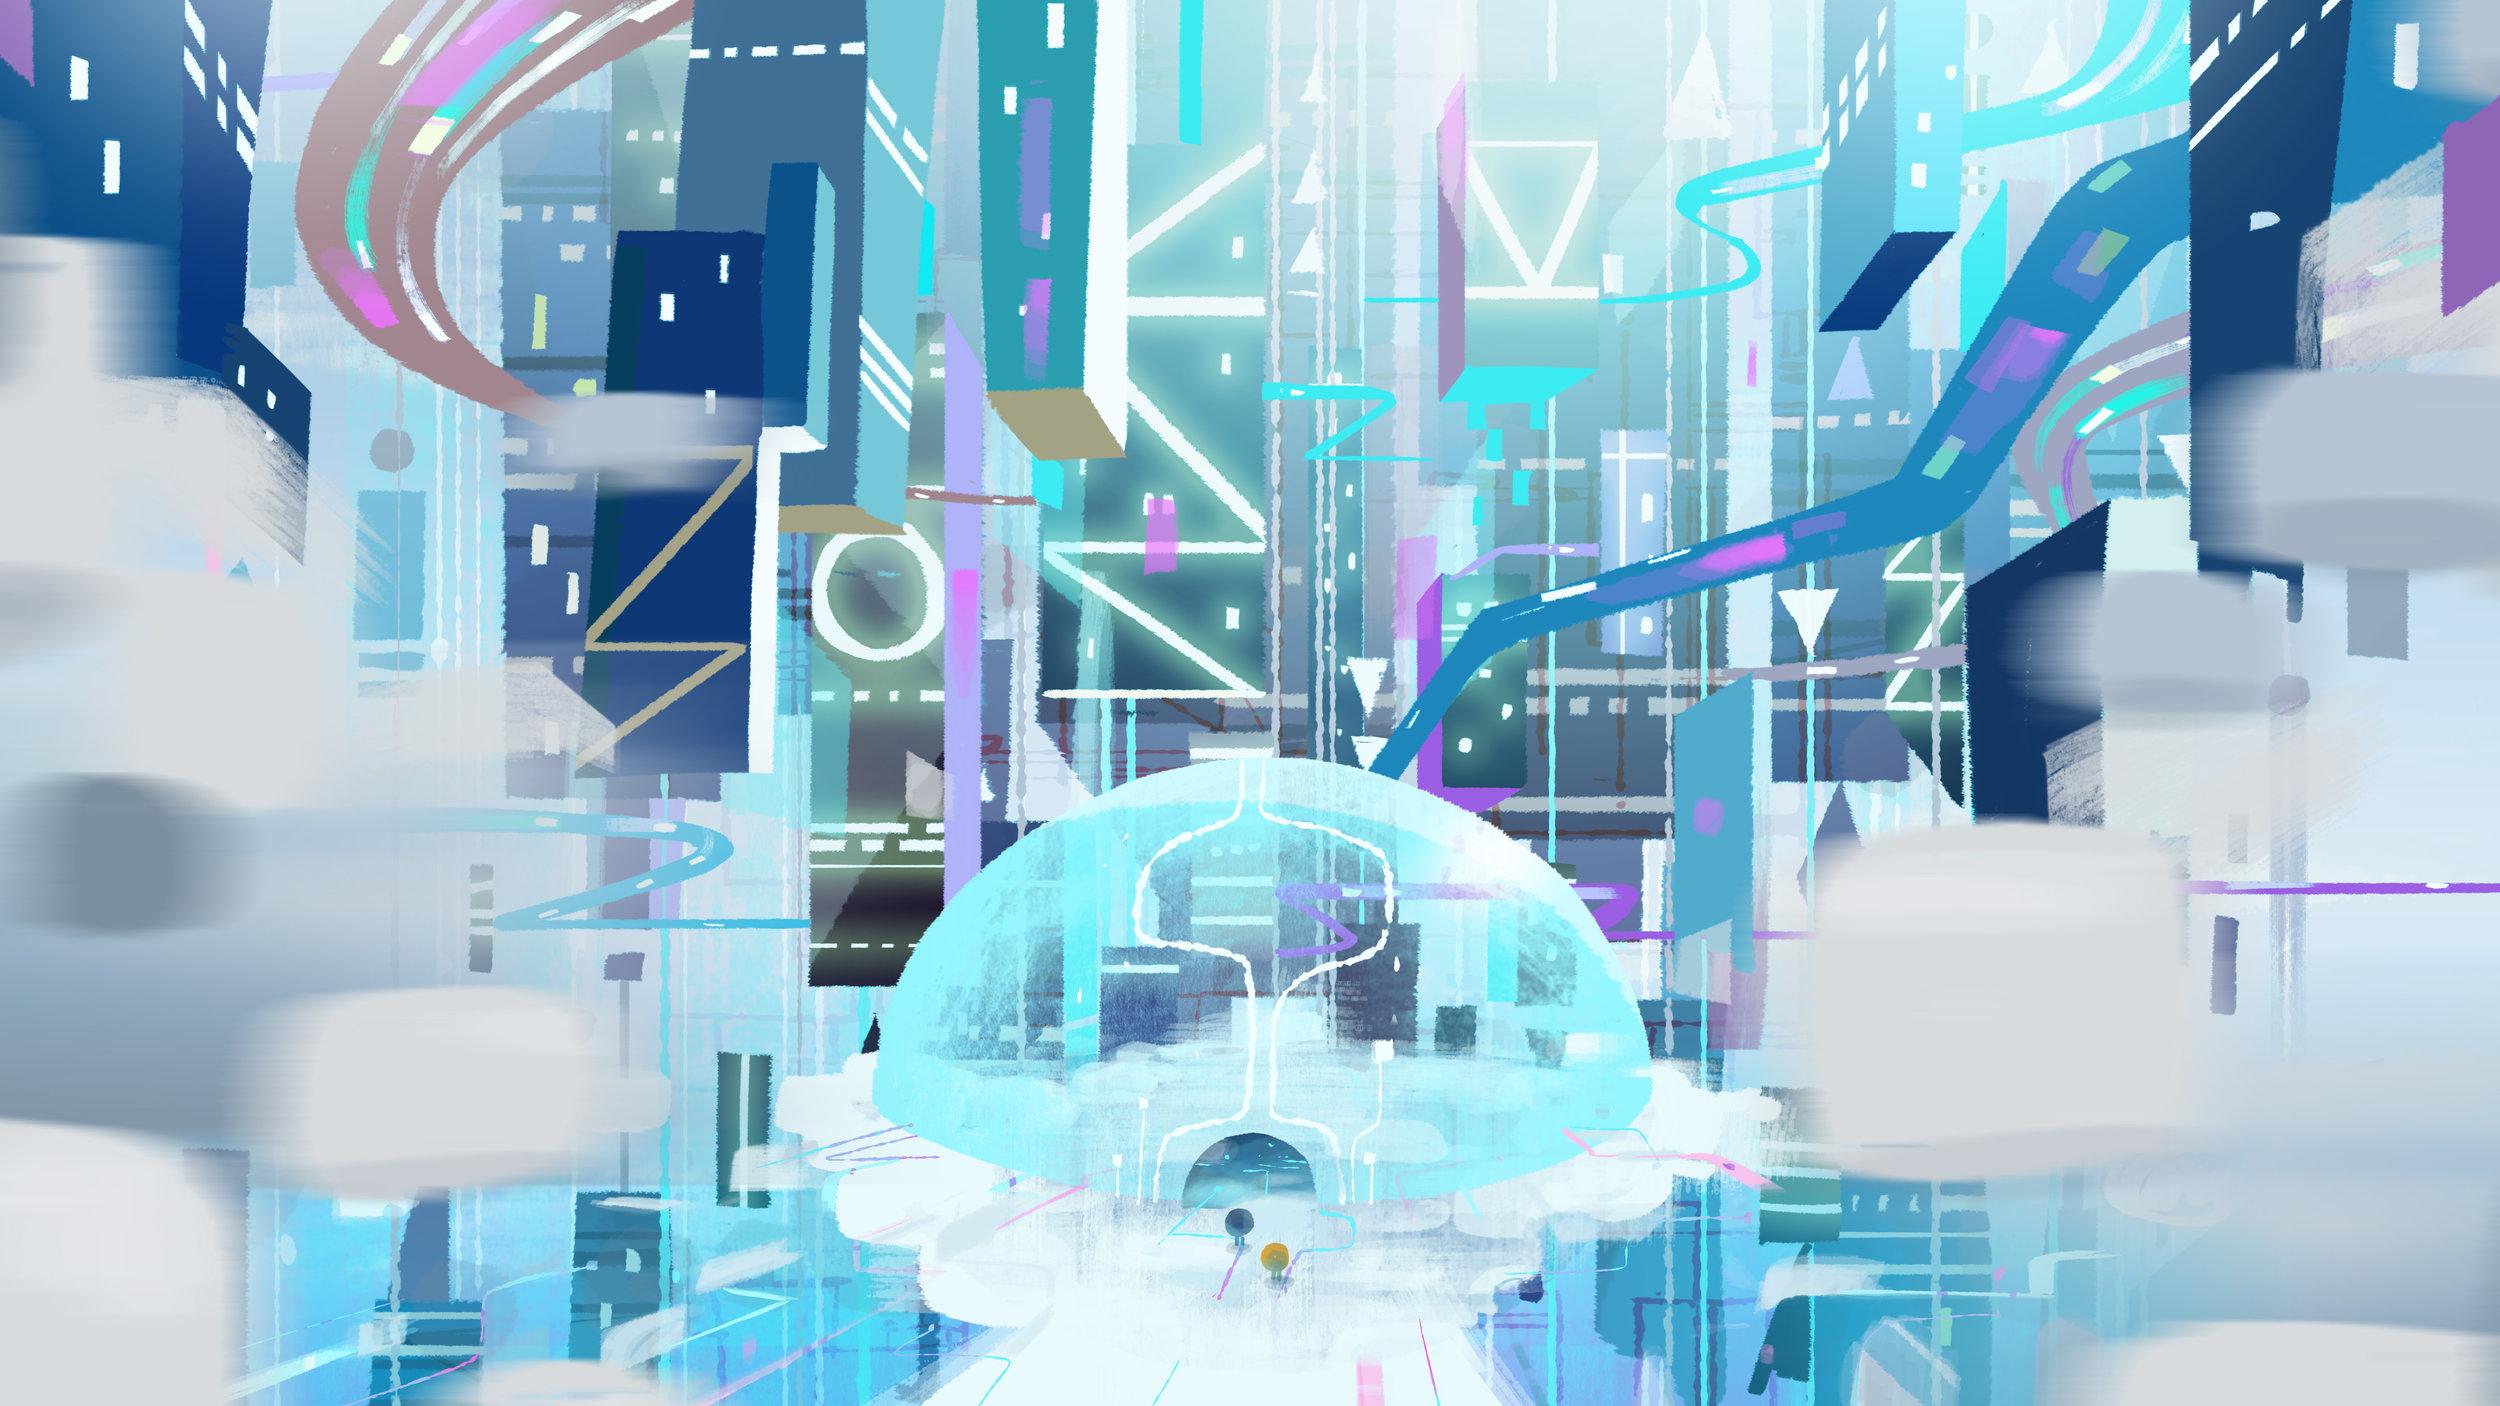 Cloudy City Design